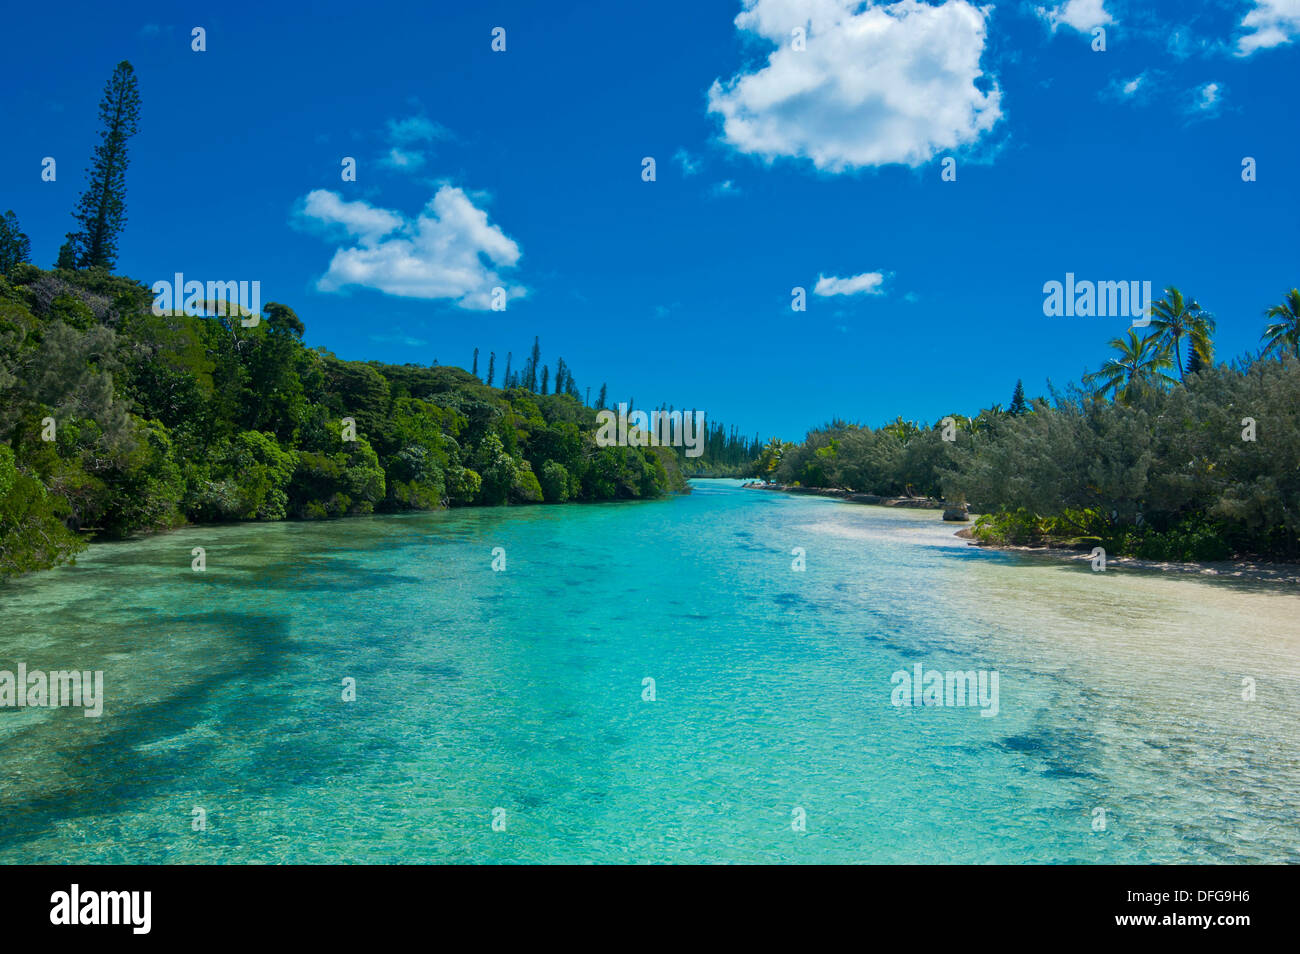 Bay de Oro, Île des Pins, New Caledonia, France - Stock Image